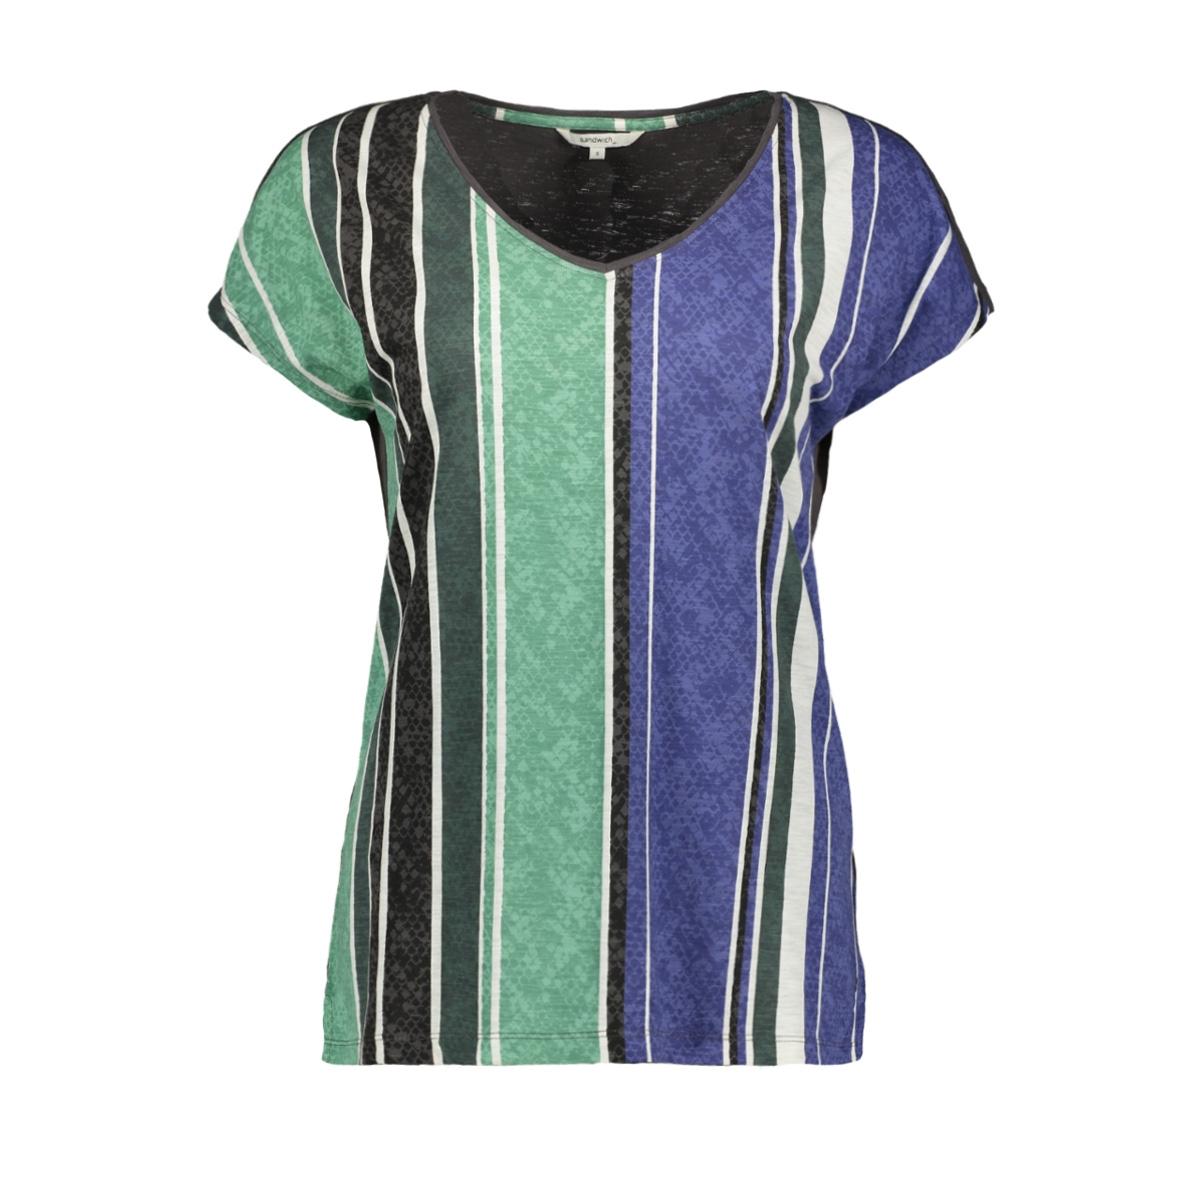 t shirt met strepen en slangen print 21101729 sandwich t-shirt 80025